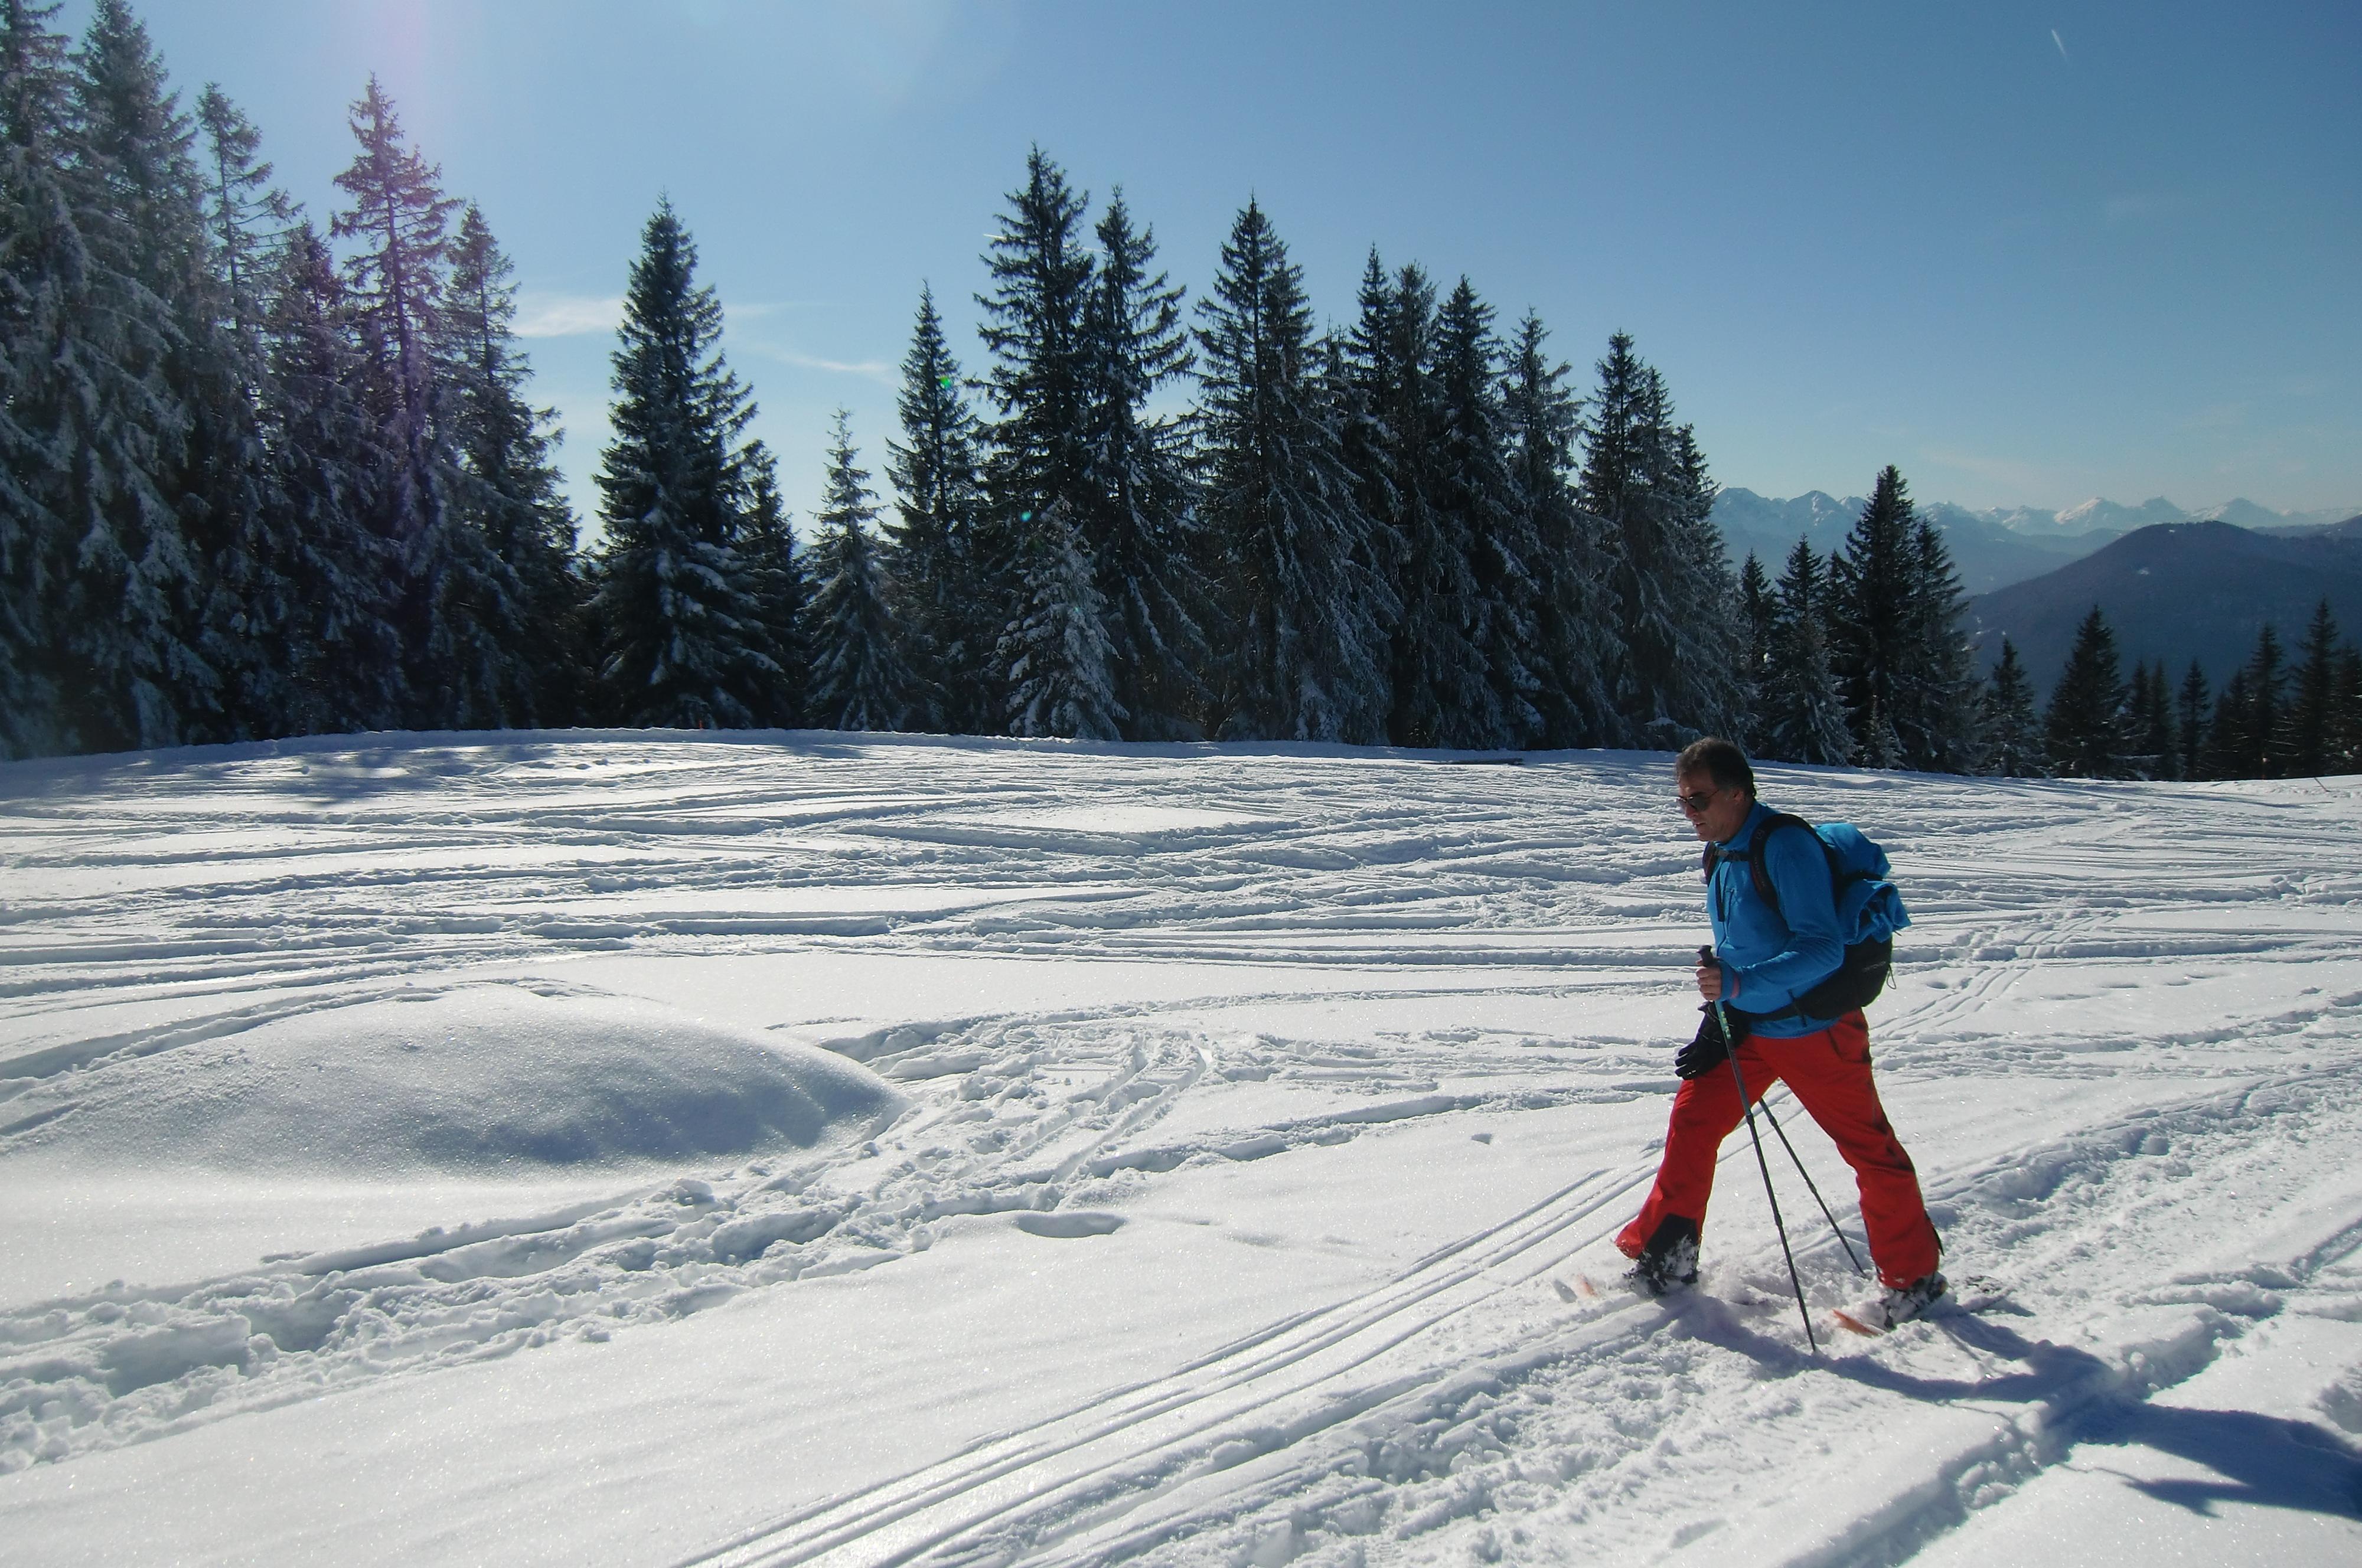 Schneeschuhwandern & Langlauf